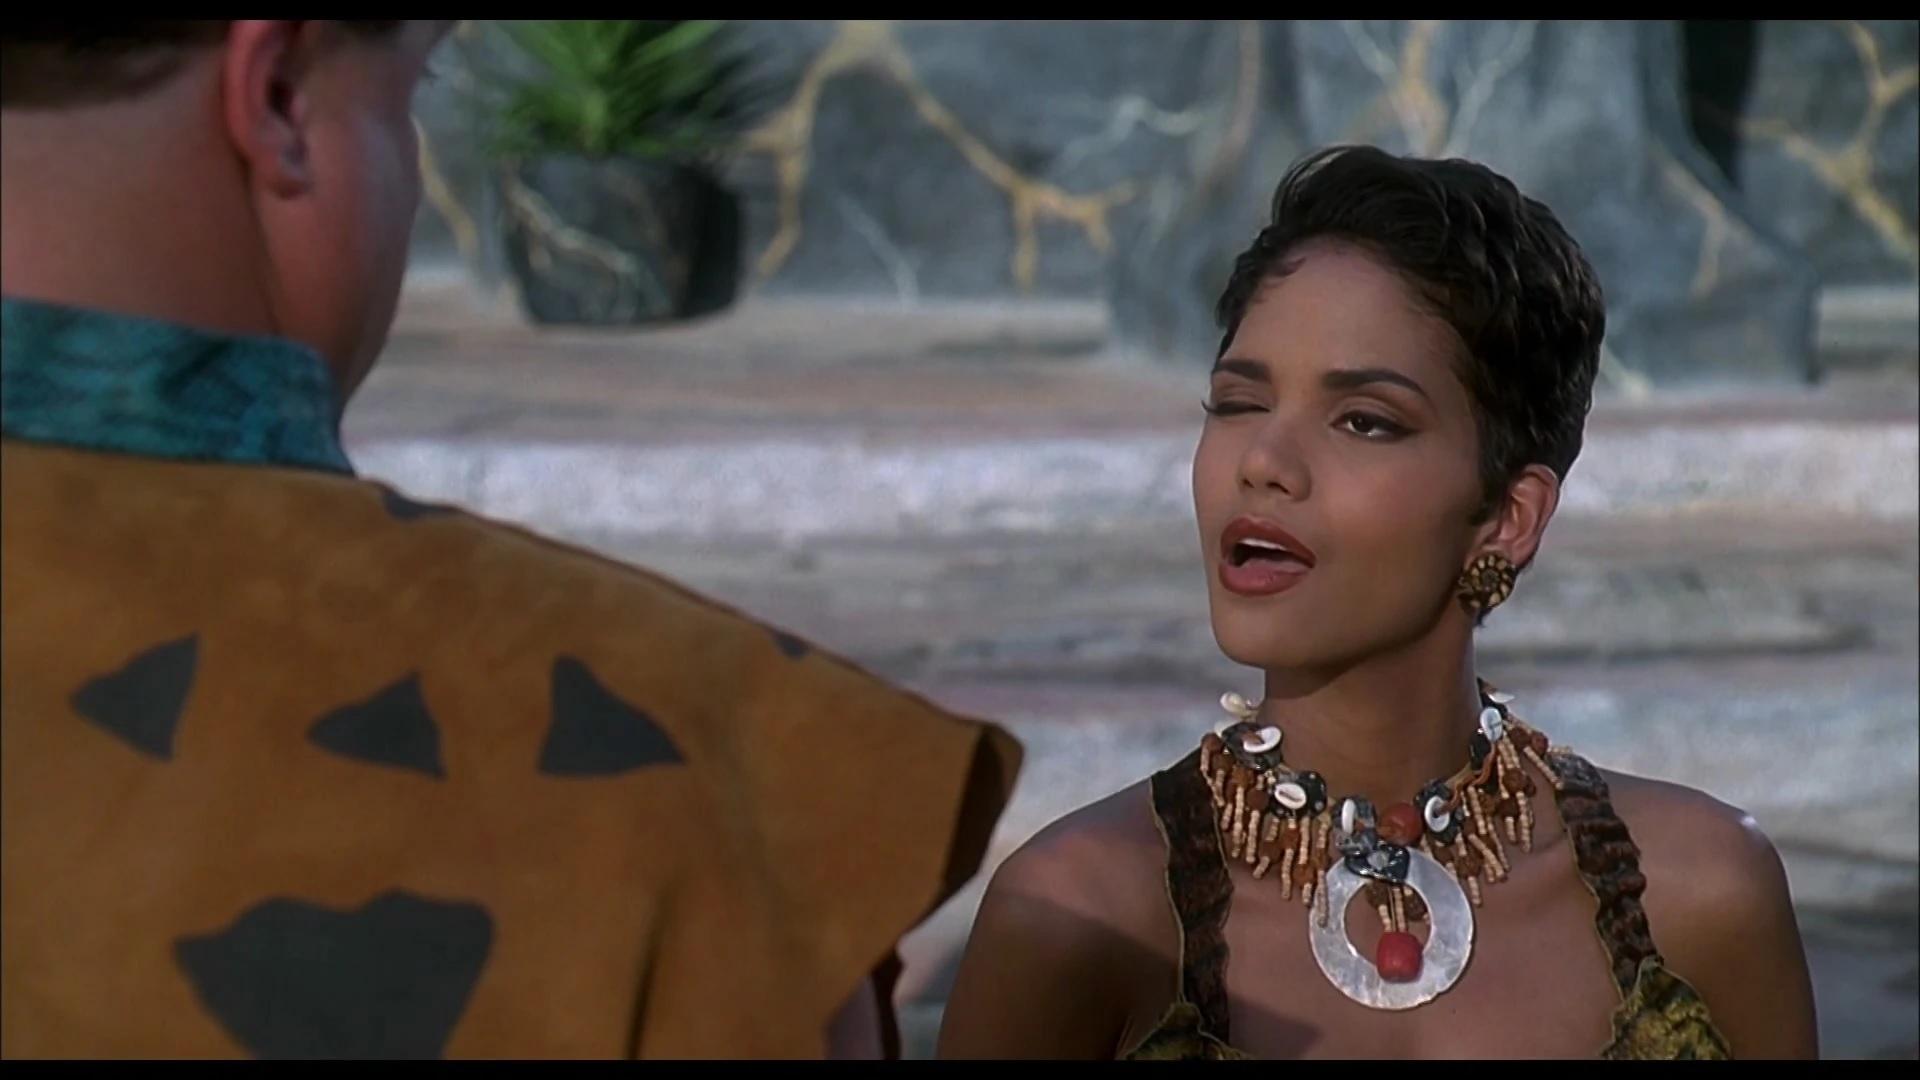 The Flintstones - 1994 Live Action Film - Sharon Stone's Wink.jpg